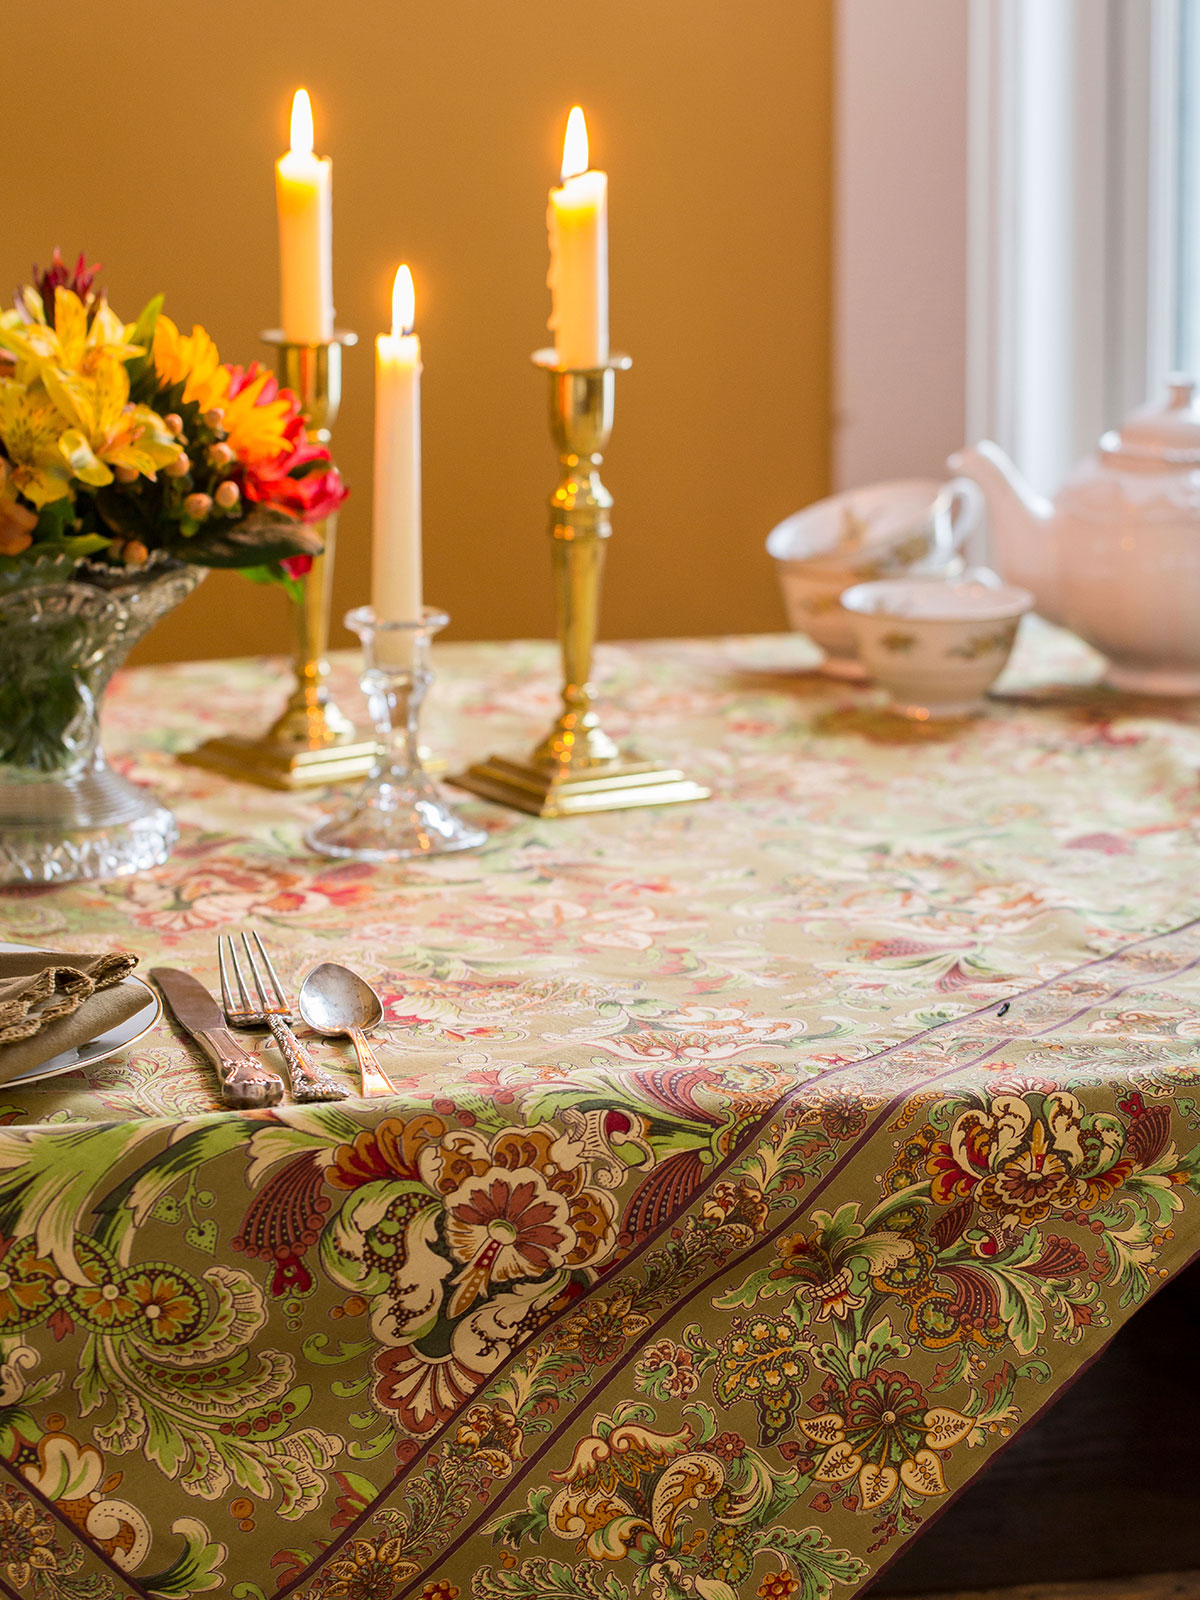 Jacob's Court Tablecloth